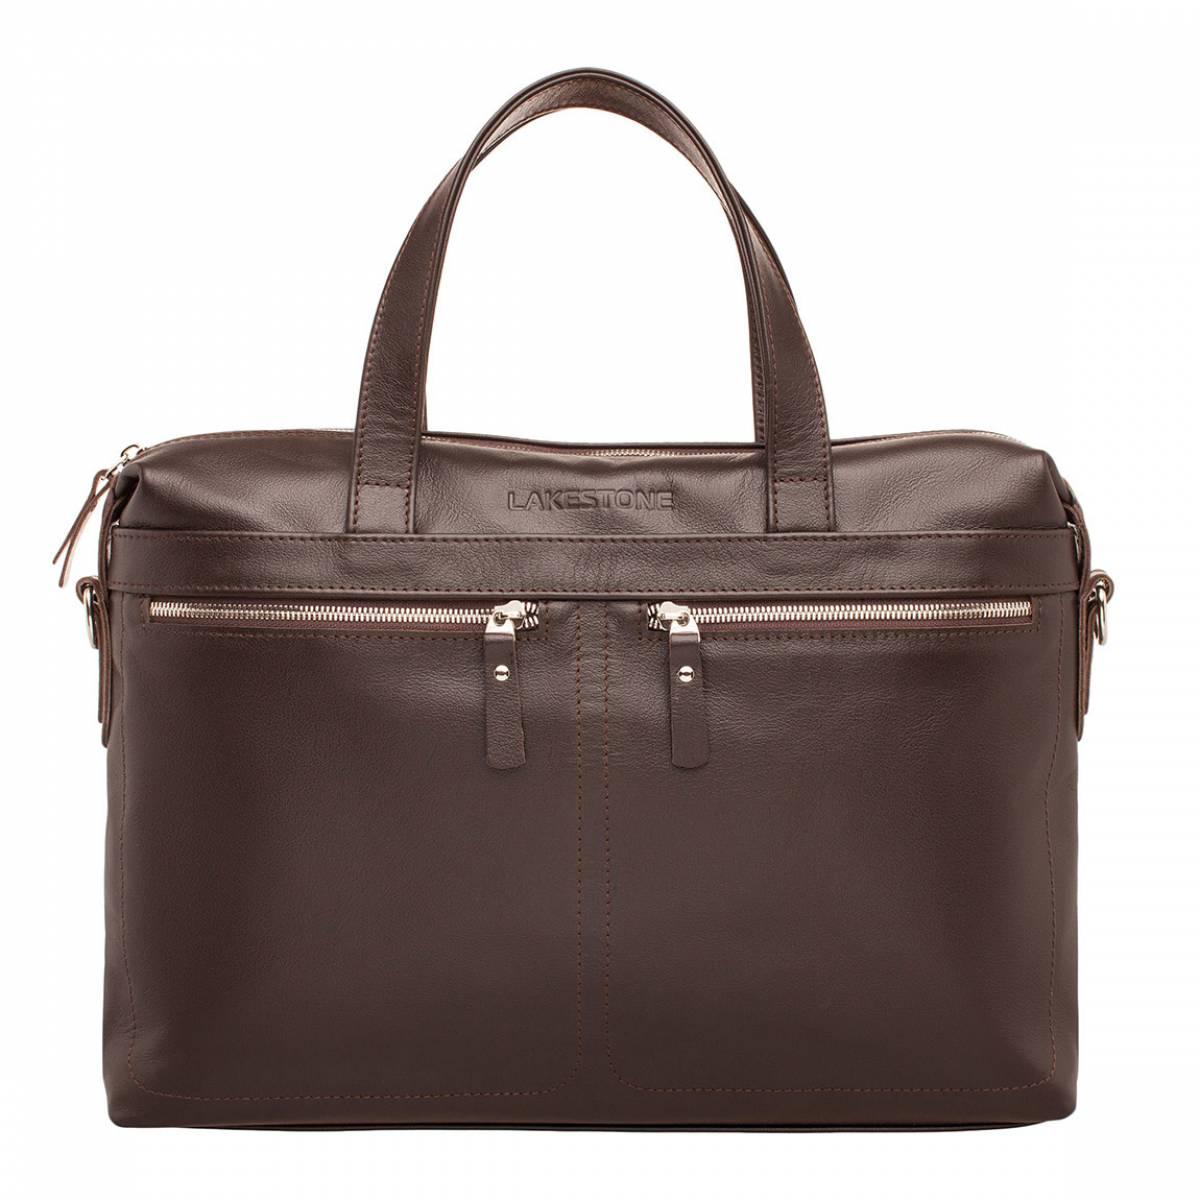 Деловая сумка Dalston Brown фото